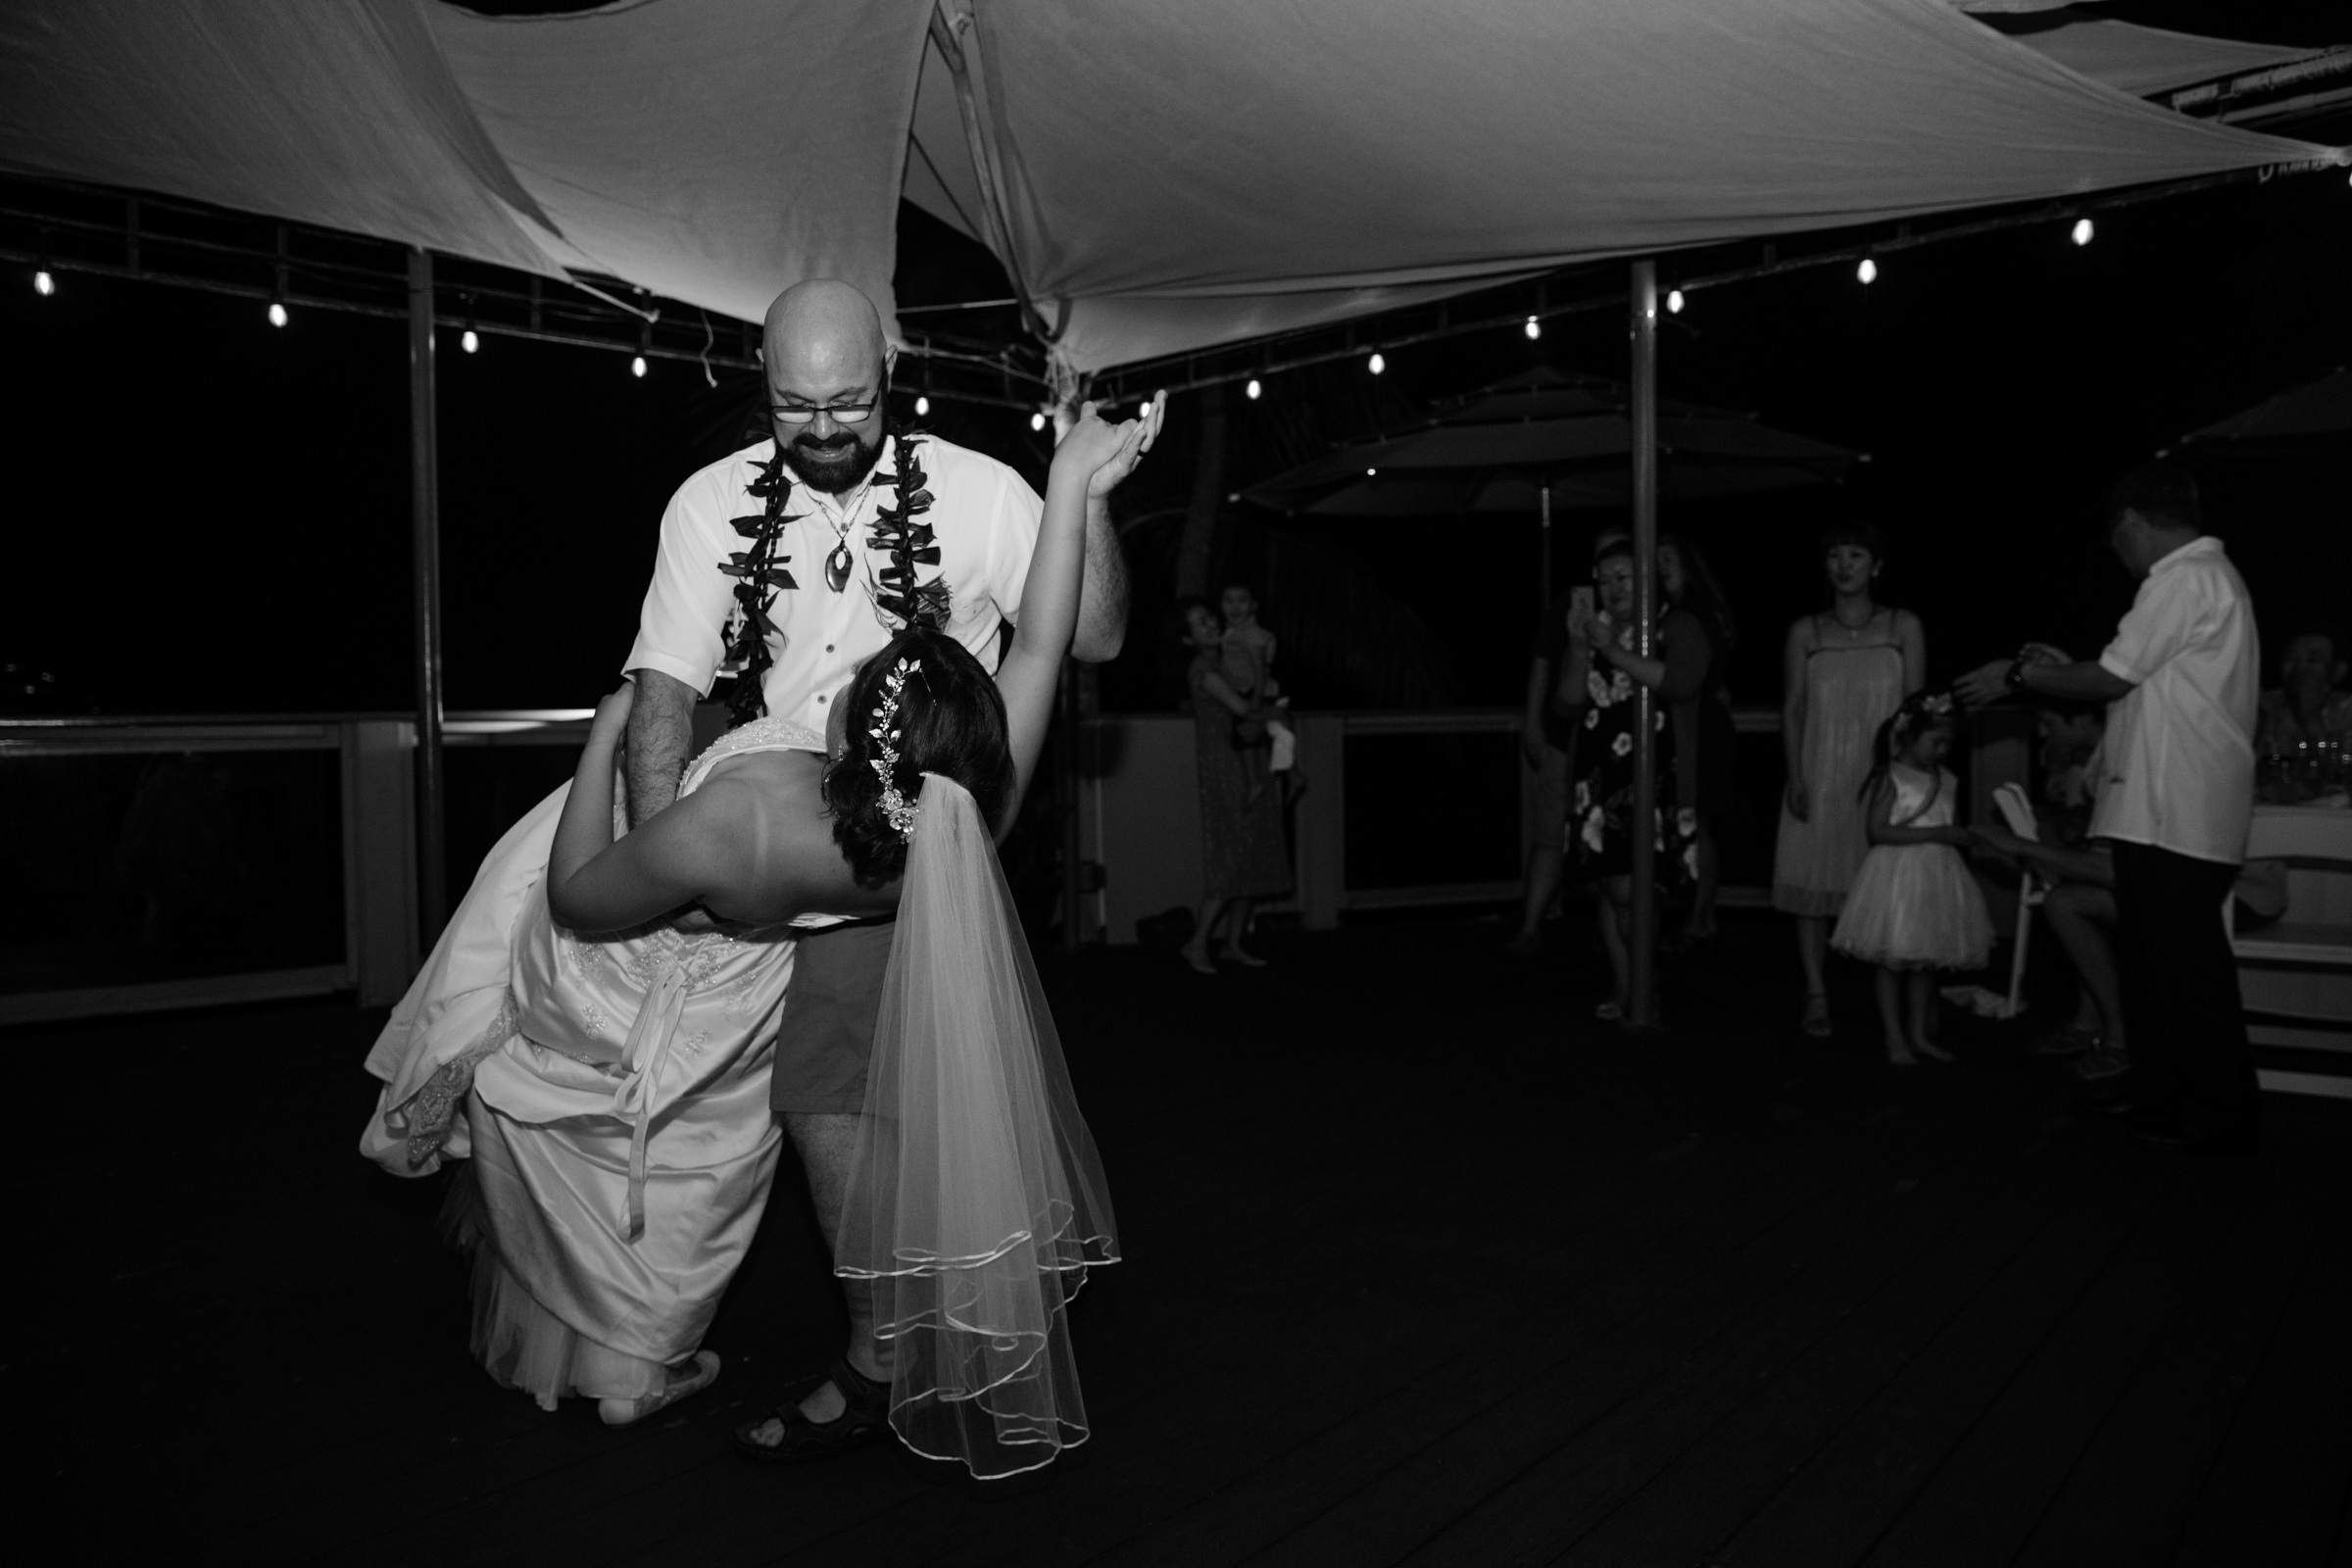 wedding-photographer-photography-destination-hawaii-lake-tahoe-reception-first-dance